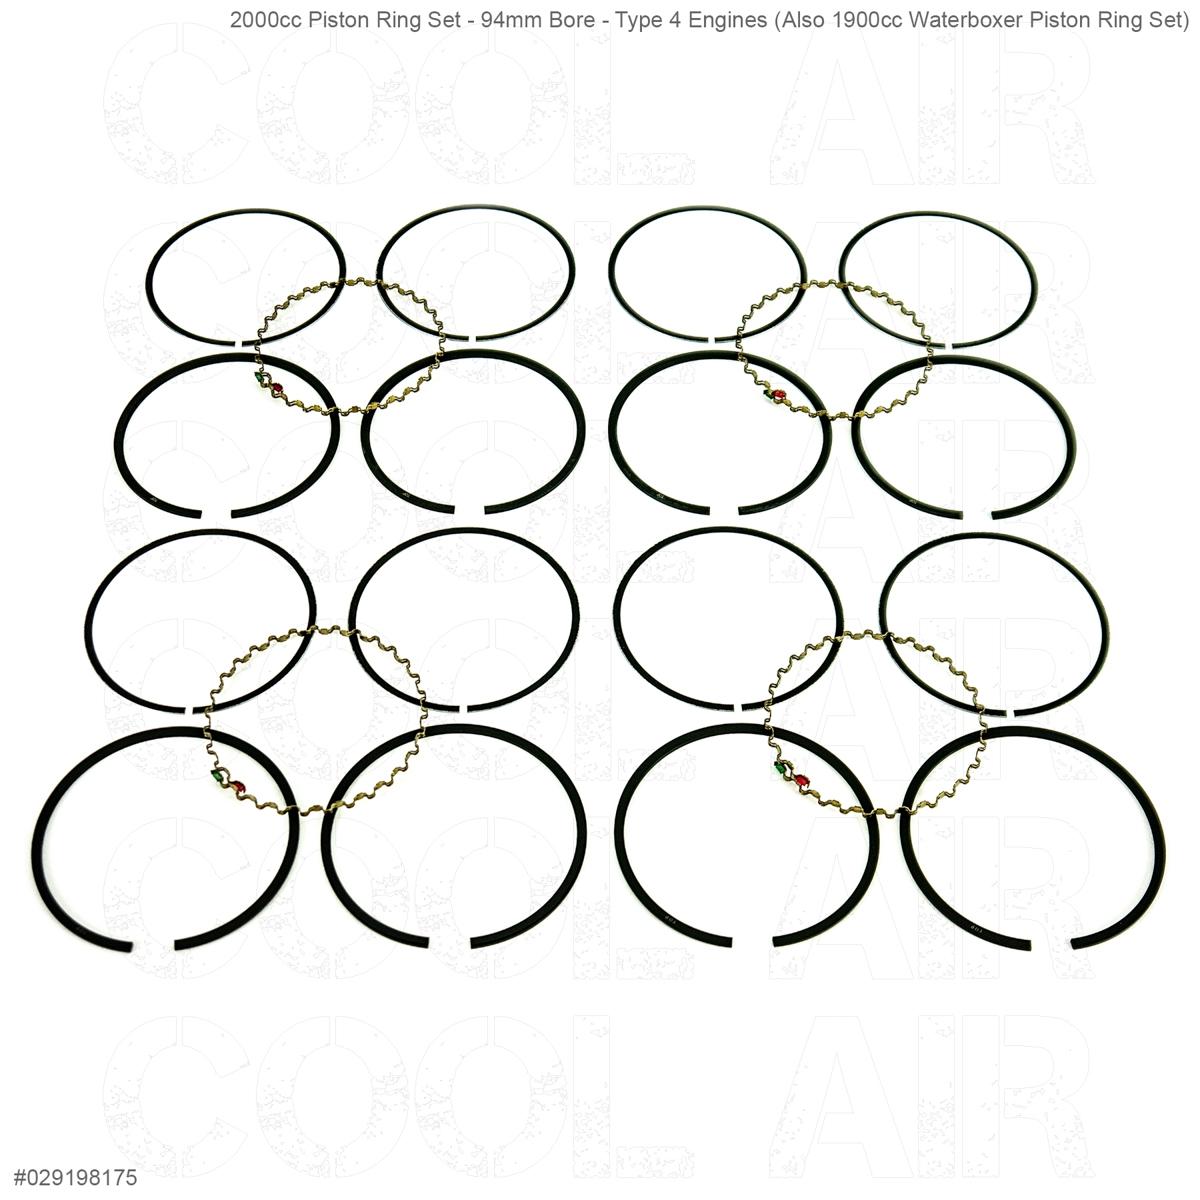 2000cc Piston Ring Set - 94mm Bore - Type 4 Engines (Also 1900cc Waterboxer Piston Ring Set)